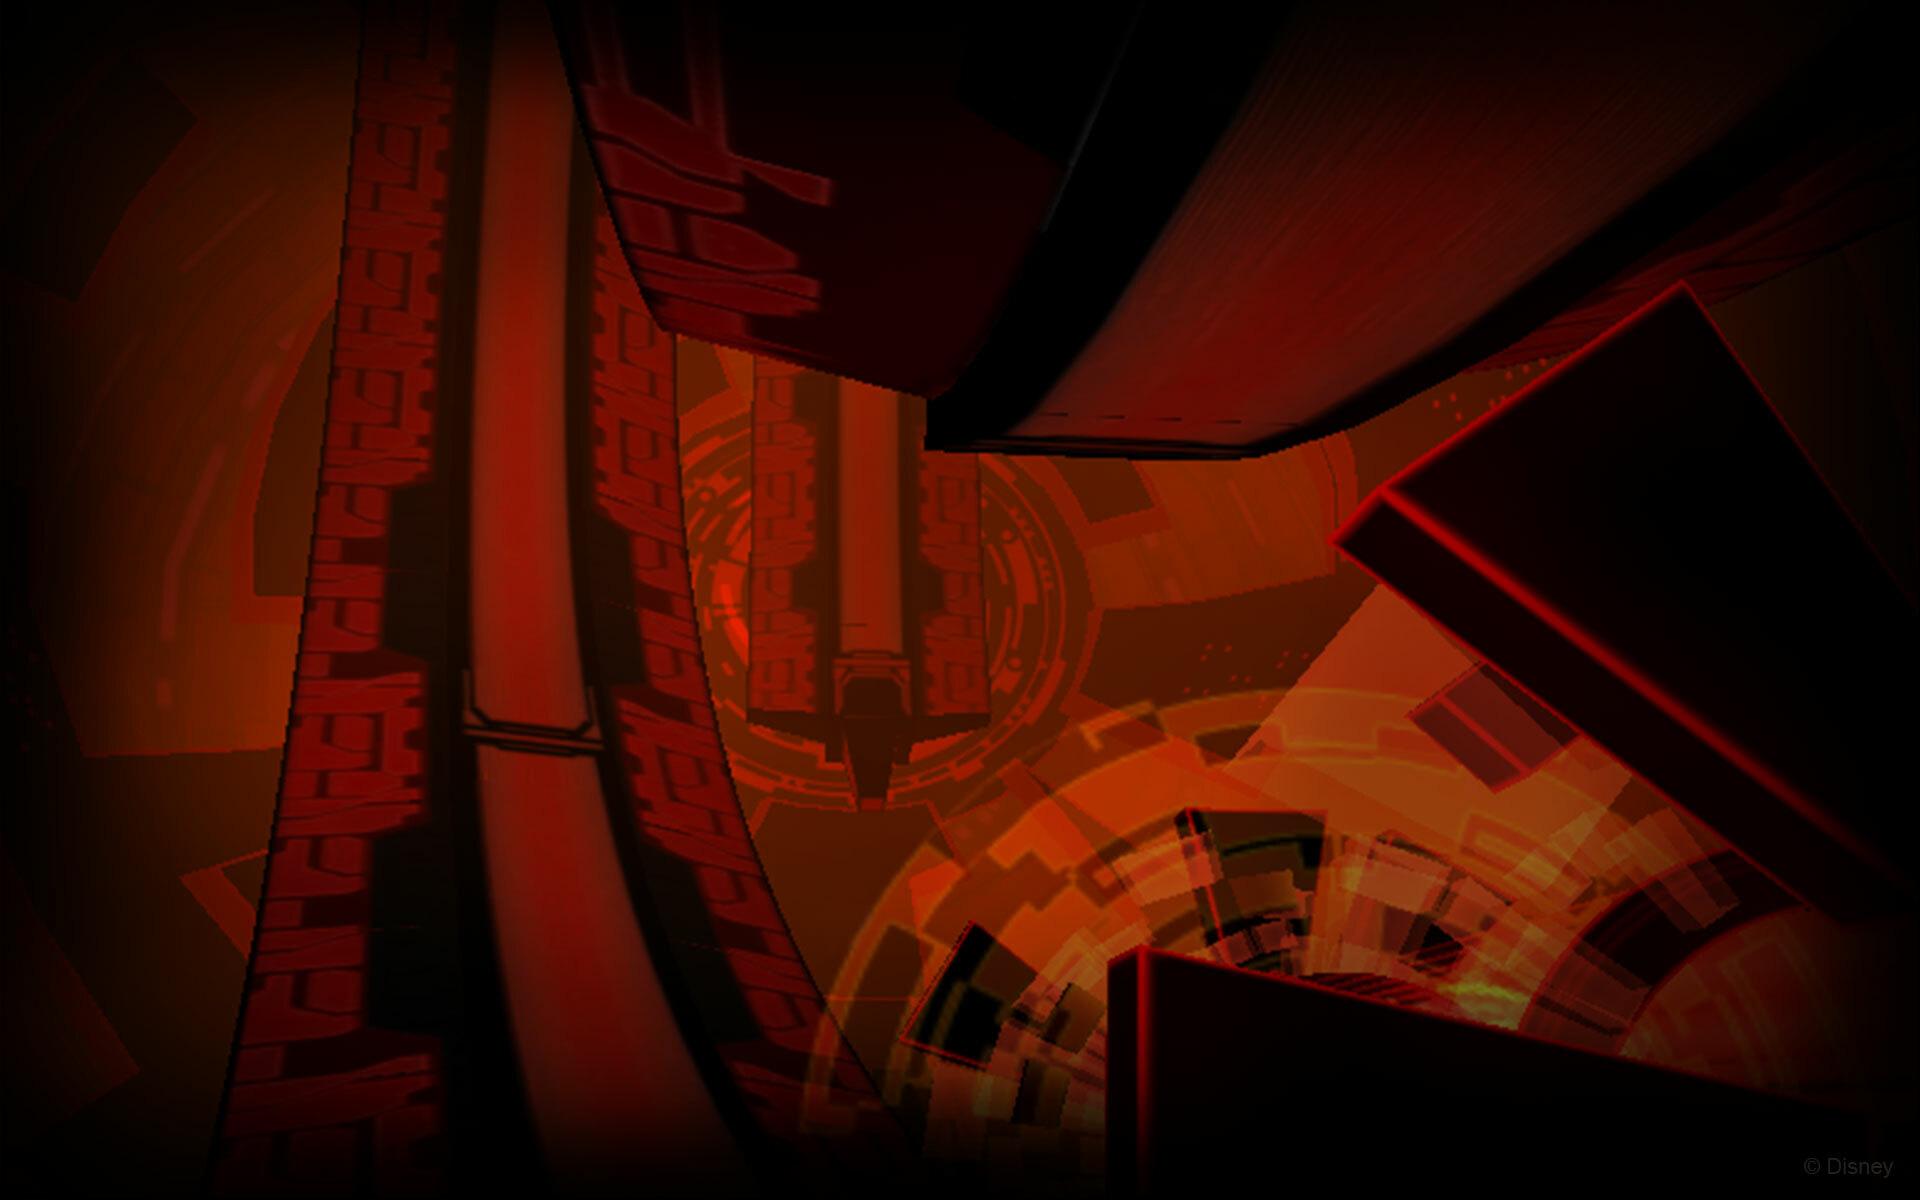 TRON 2.0: Programmed by Kevin Flynn